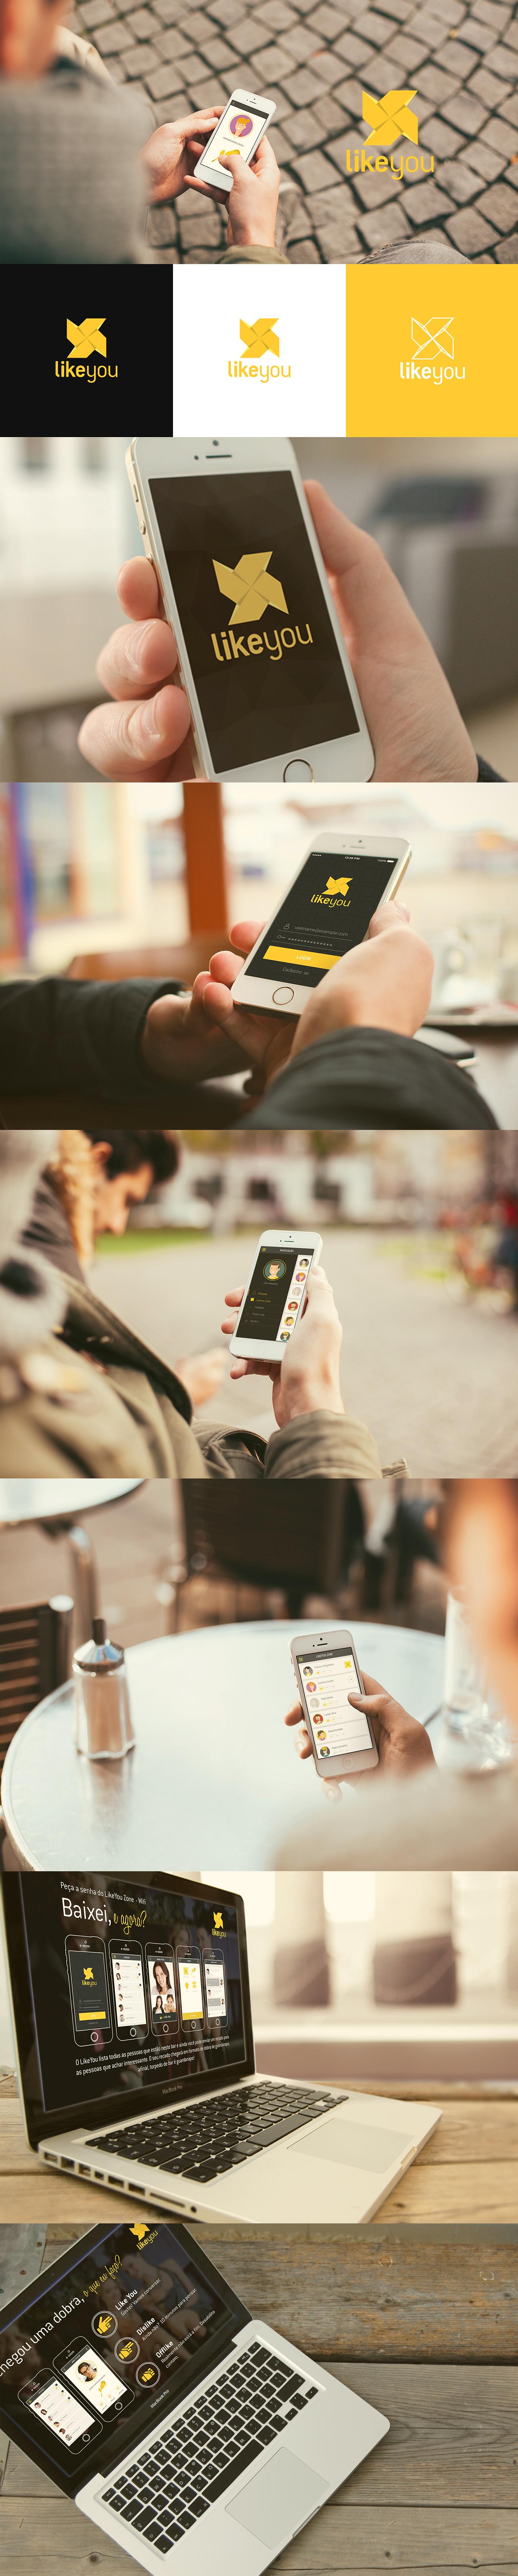 aplicativo relacionamento likeyou app friends tecnology yellow people brand logo Interface